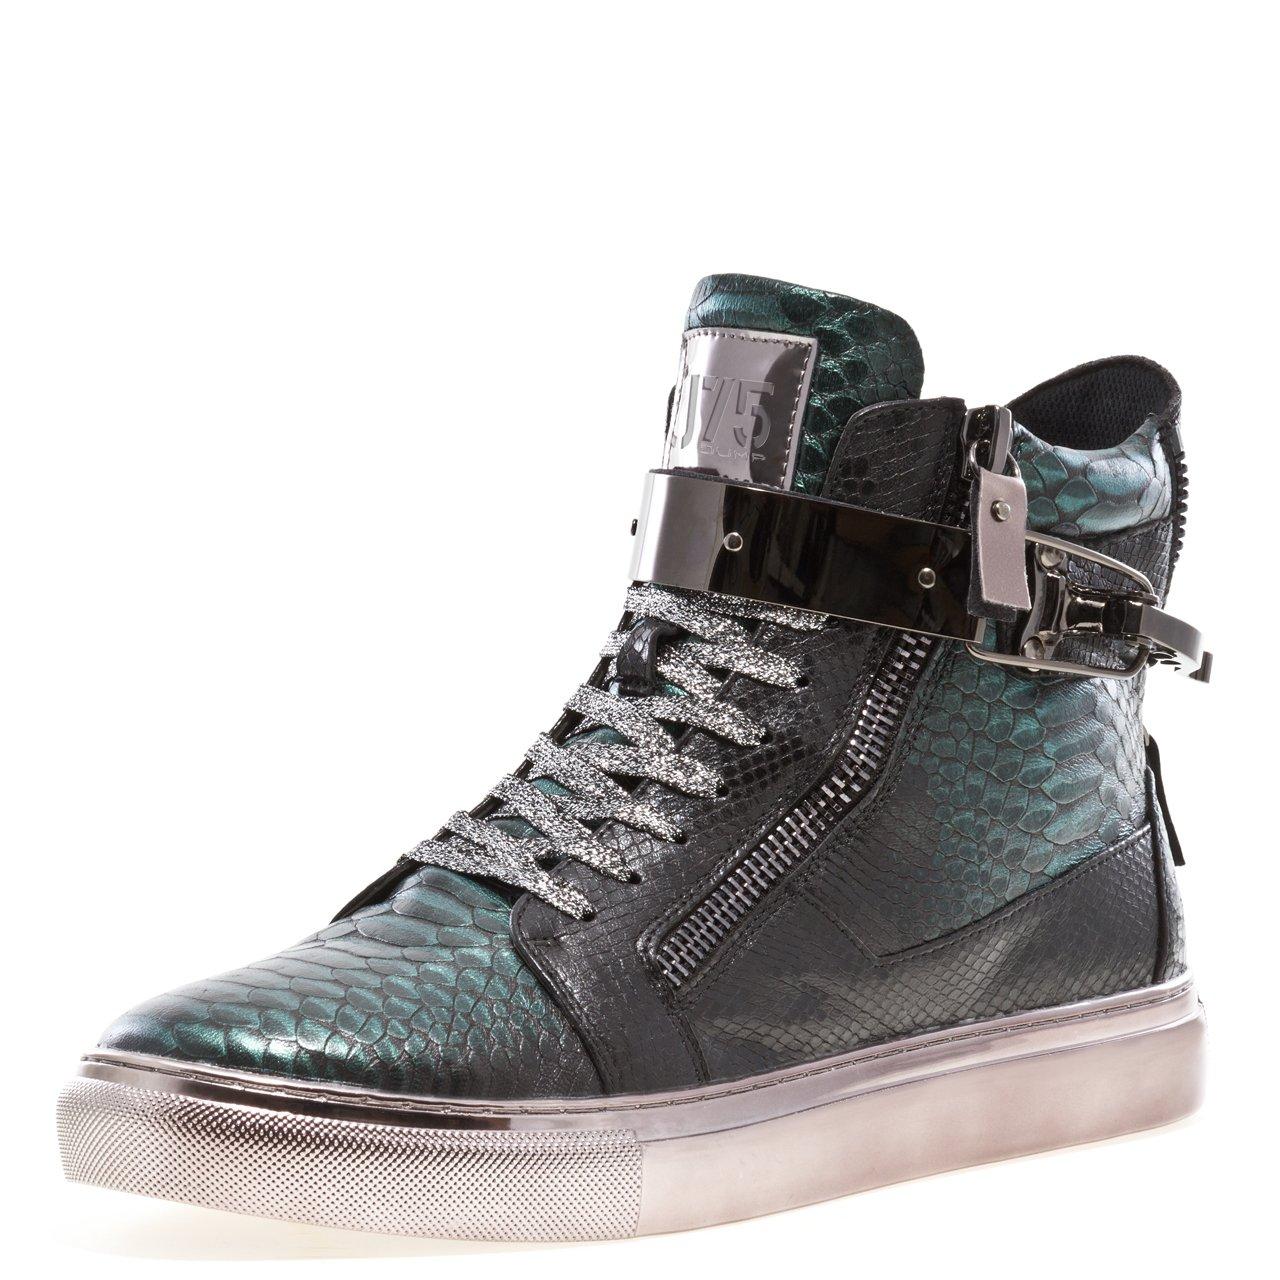 J75 by Jump Men's Zeus High-Top Fashion Sneaker Green Viper 11 D US by Jump